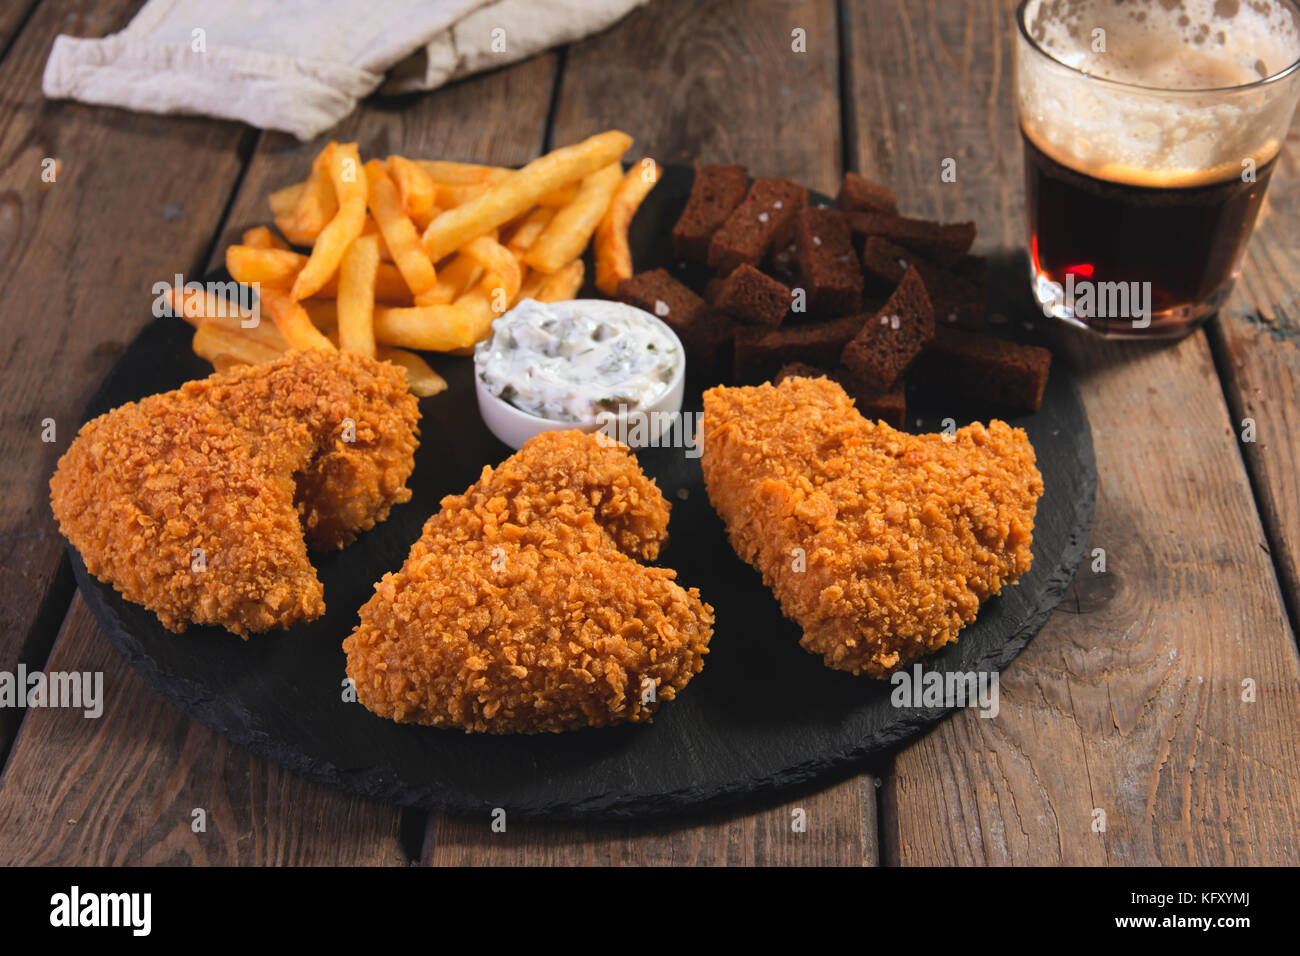 Fried Chicken Wings knusprig paniert mit Pommes frites frittiert Roggenbrot croutons Bier Snack Stockbild